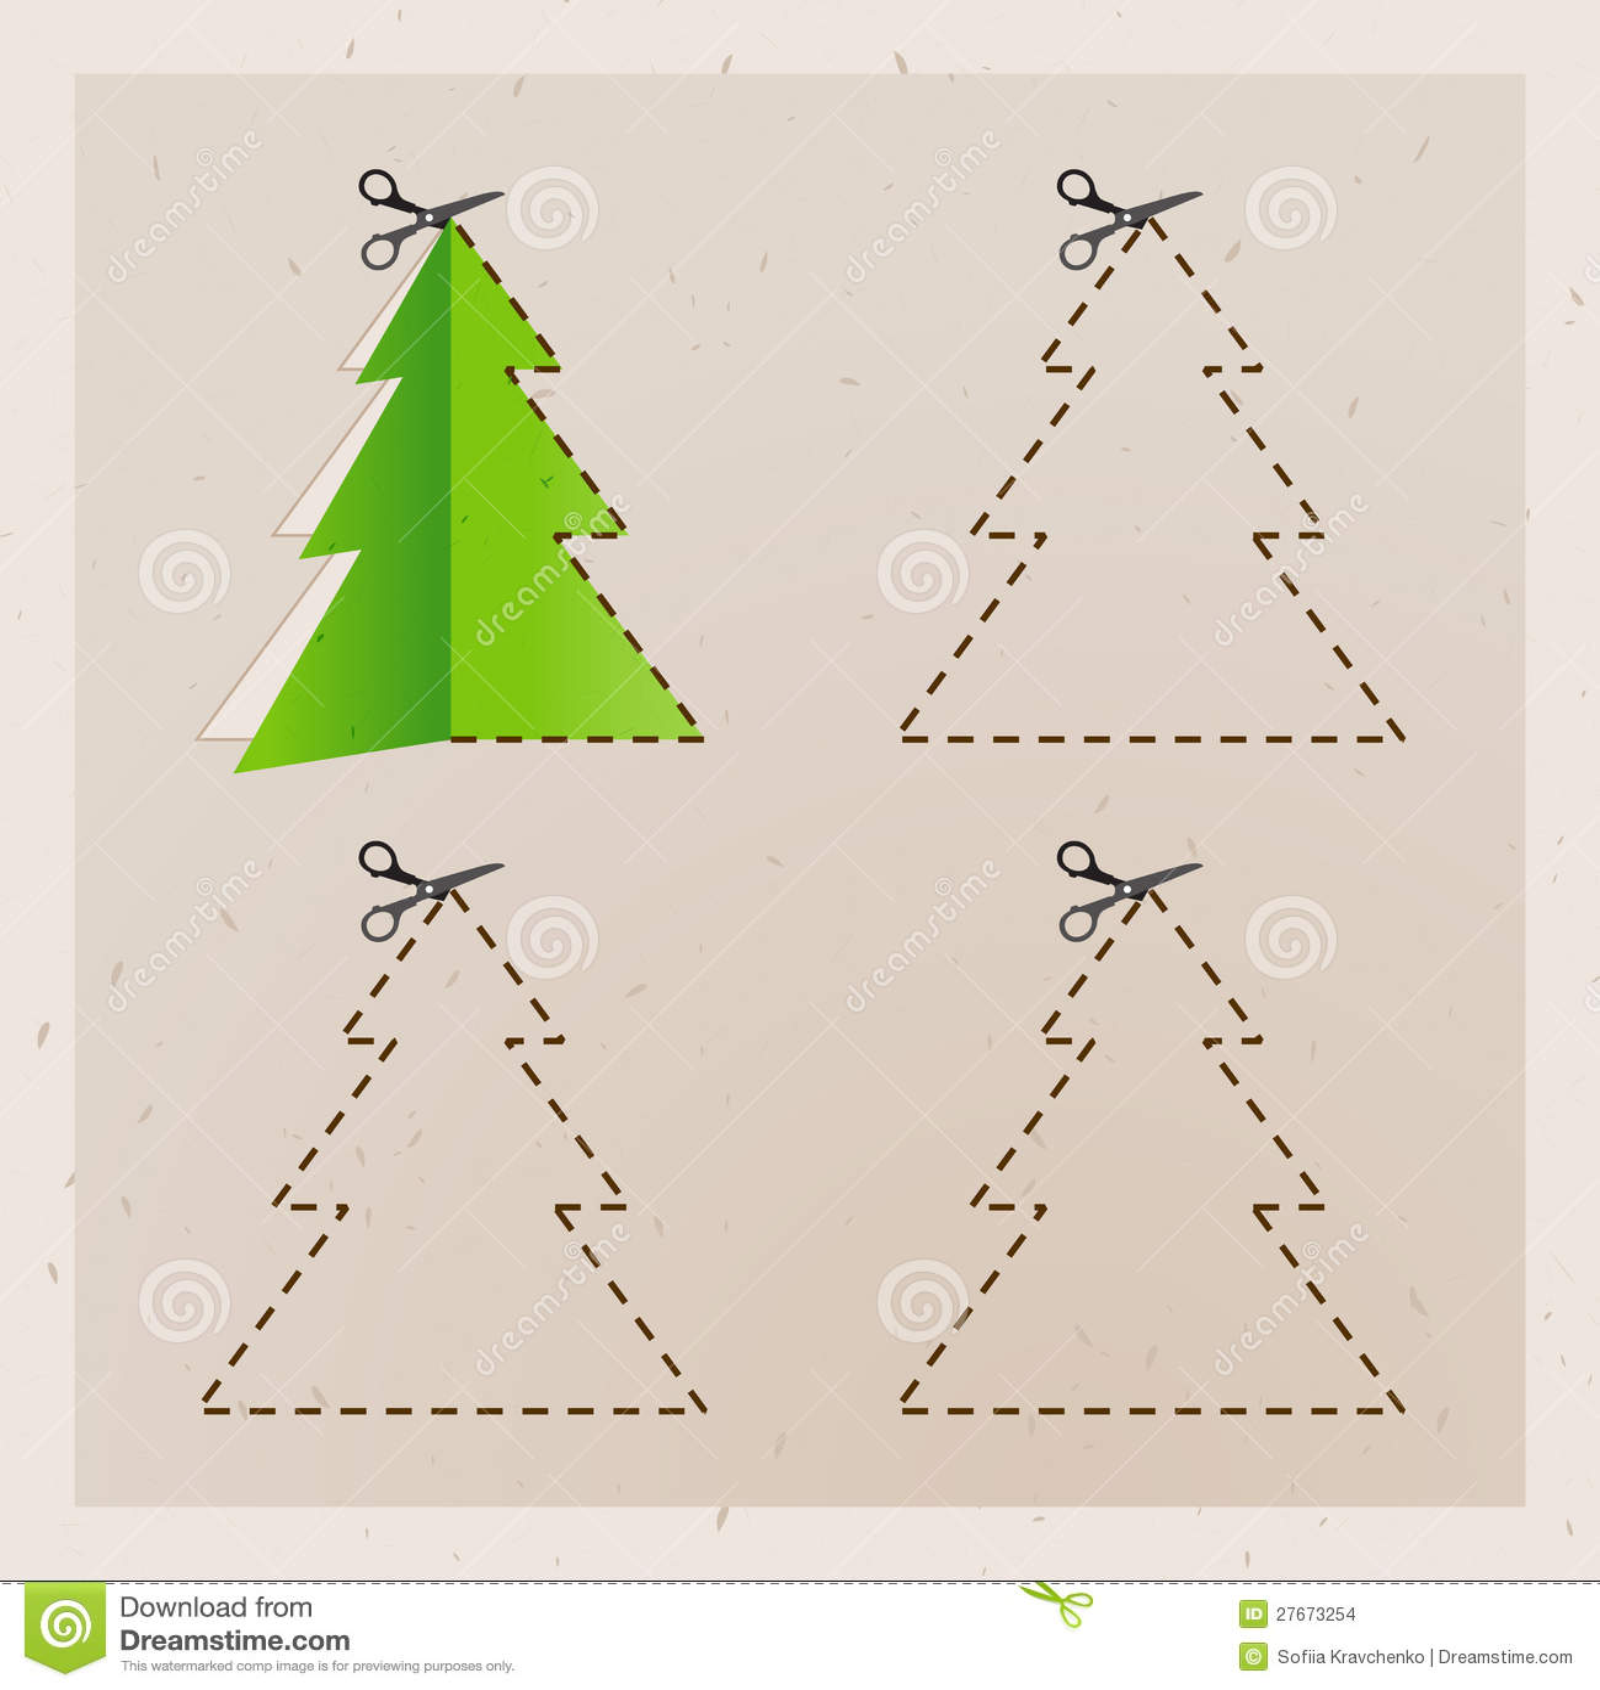 Scissors Cut Christmas Tree. Stock Images - Image: 27673254